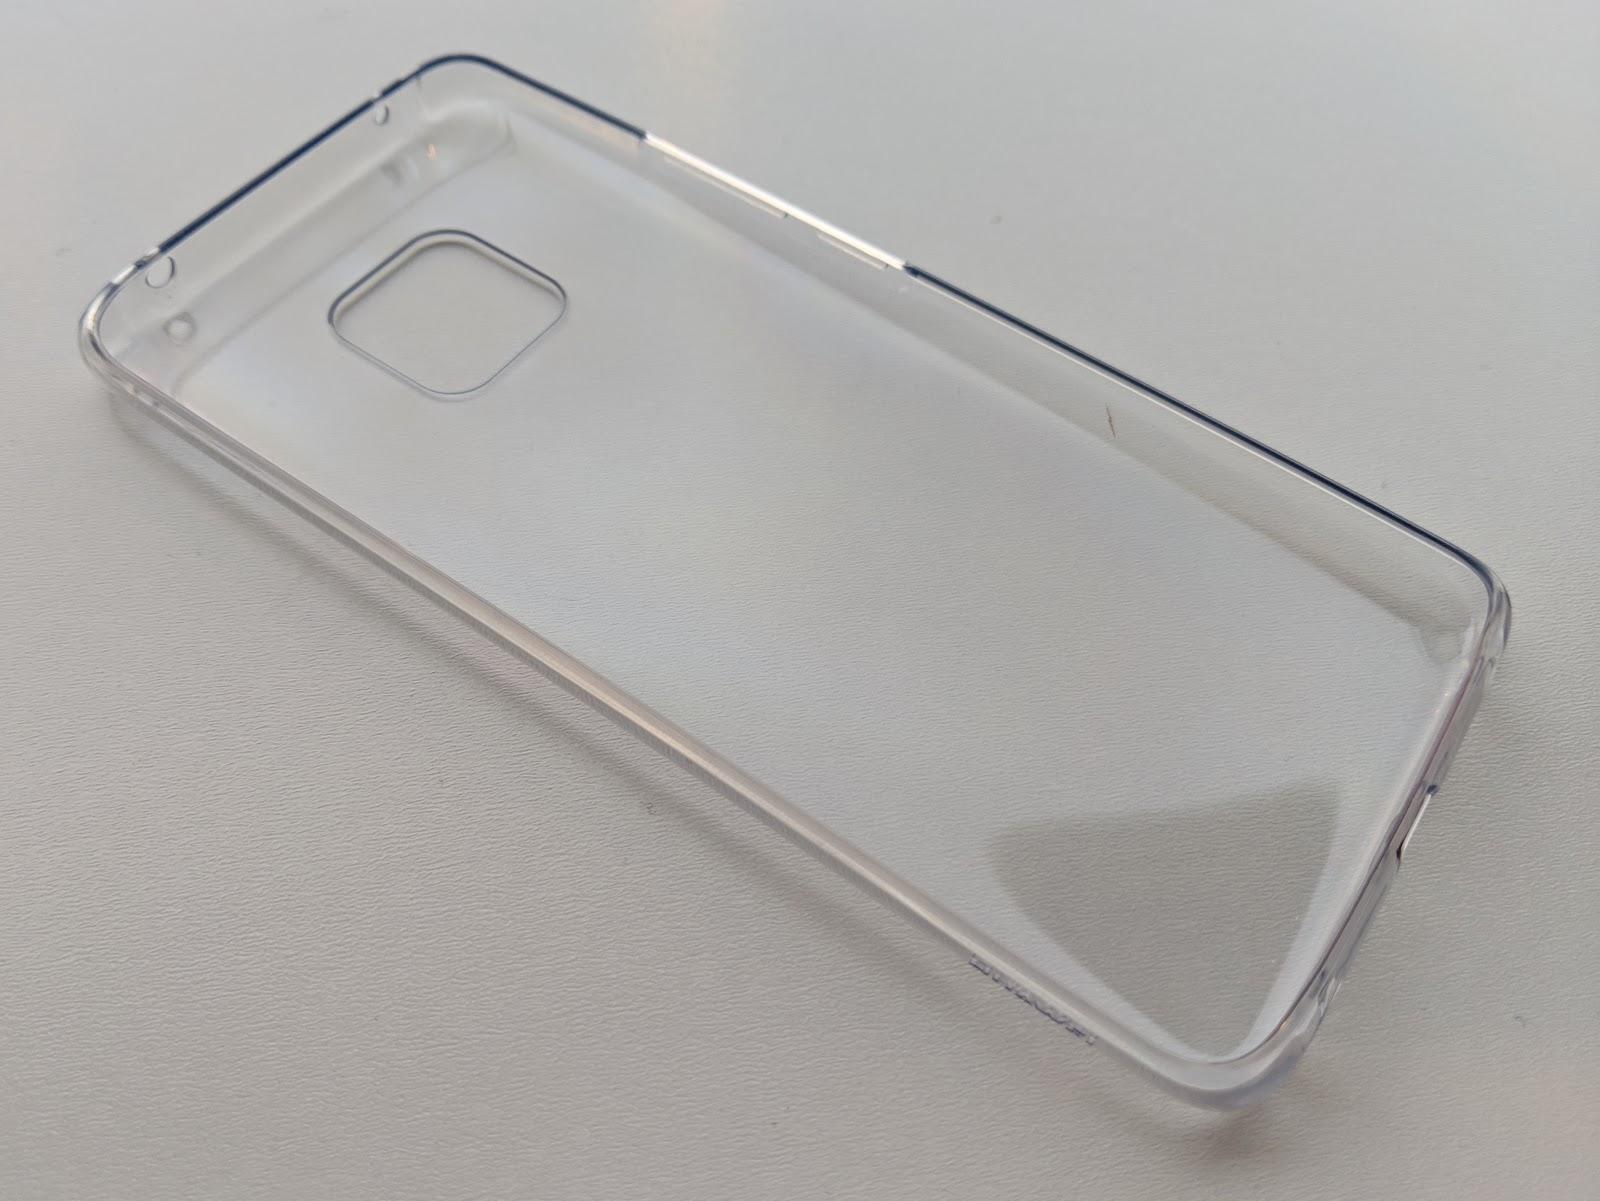 Huawei Mate 20 Pro case roundup